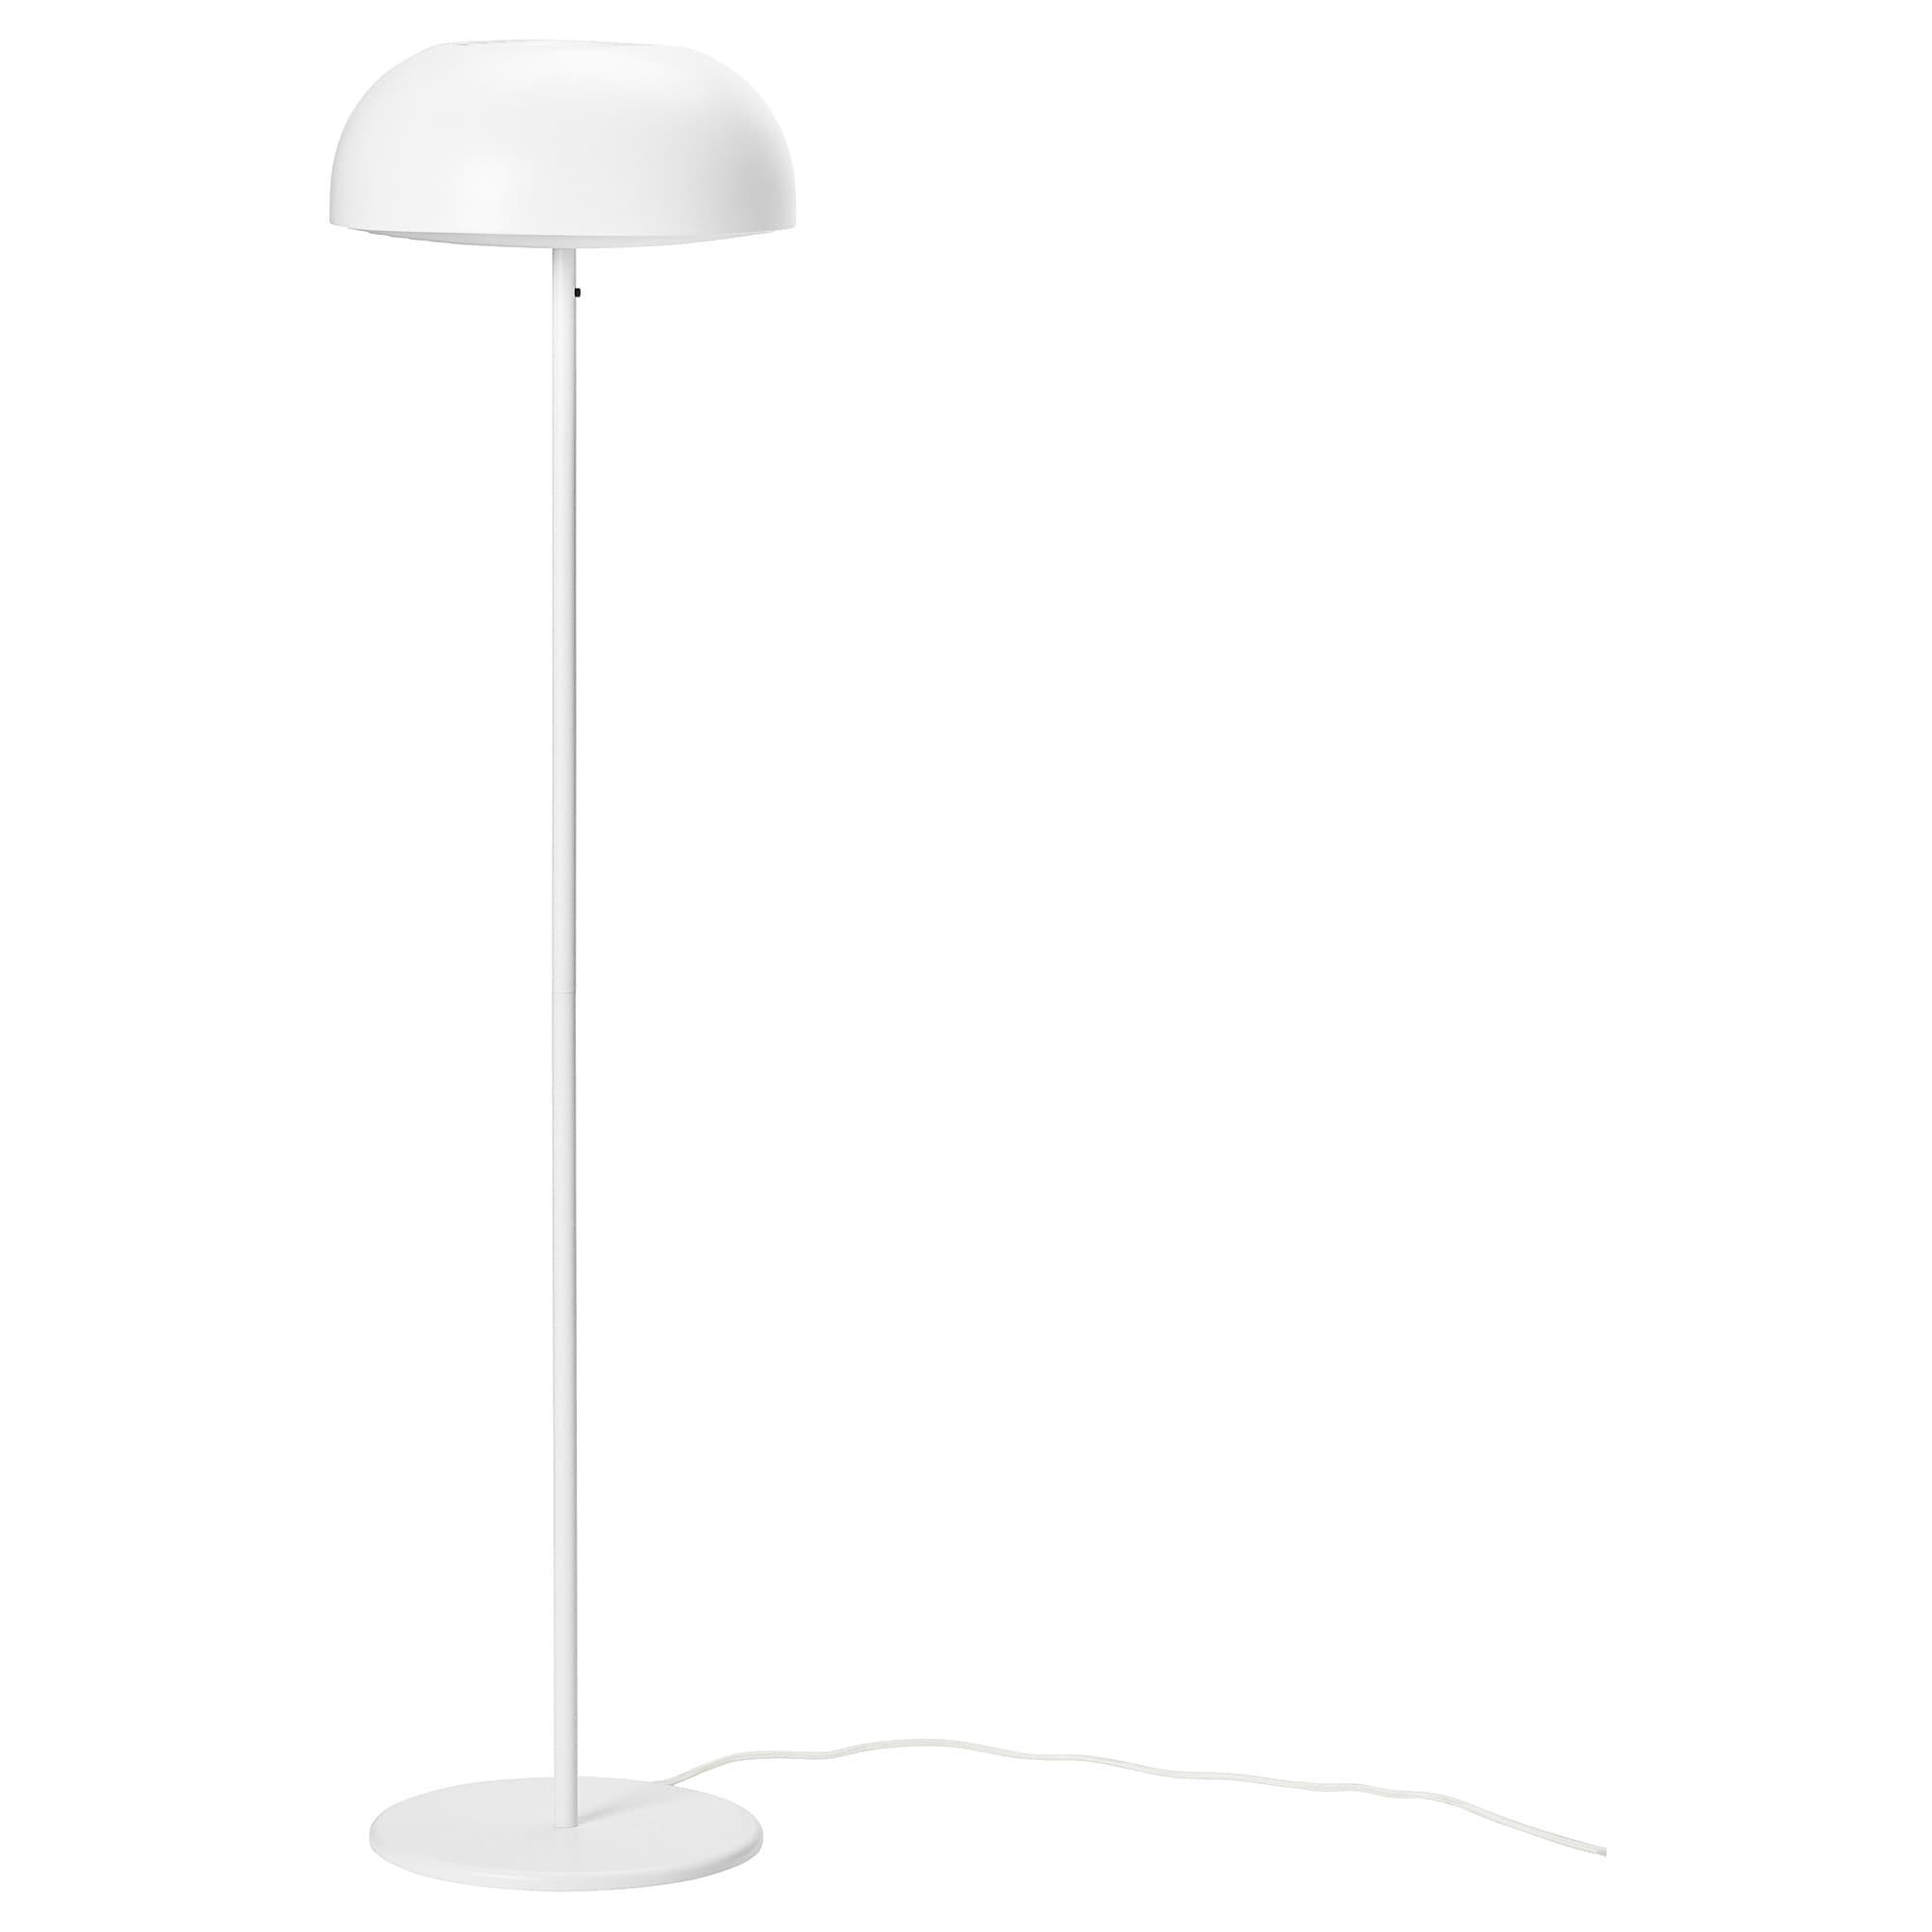 Ikea Nymane White Floor Lamp With Led Bulb Ikea Floor Lamp